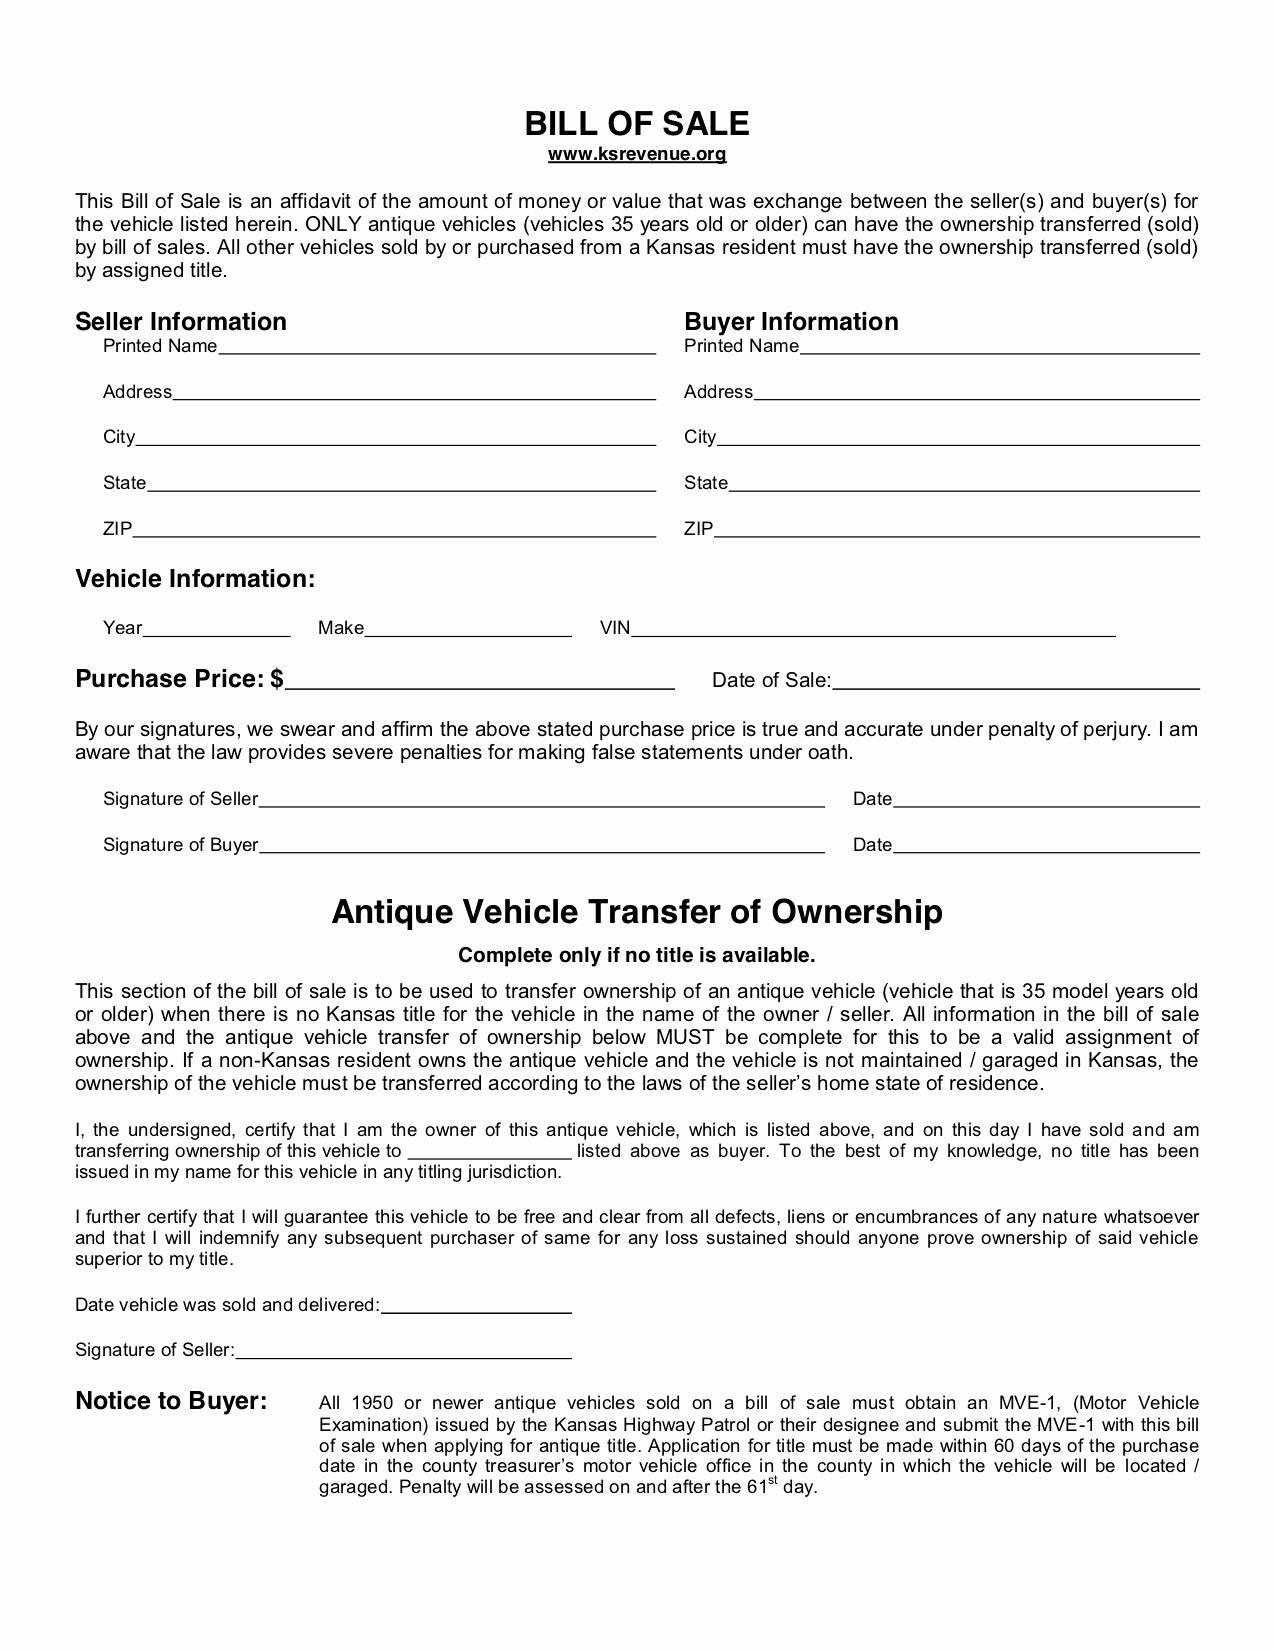 Template Bill Of Sale Car Inspirational Free Kansas Bill Of Sale form Pdf Template